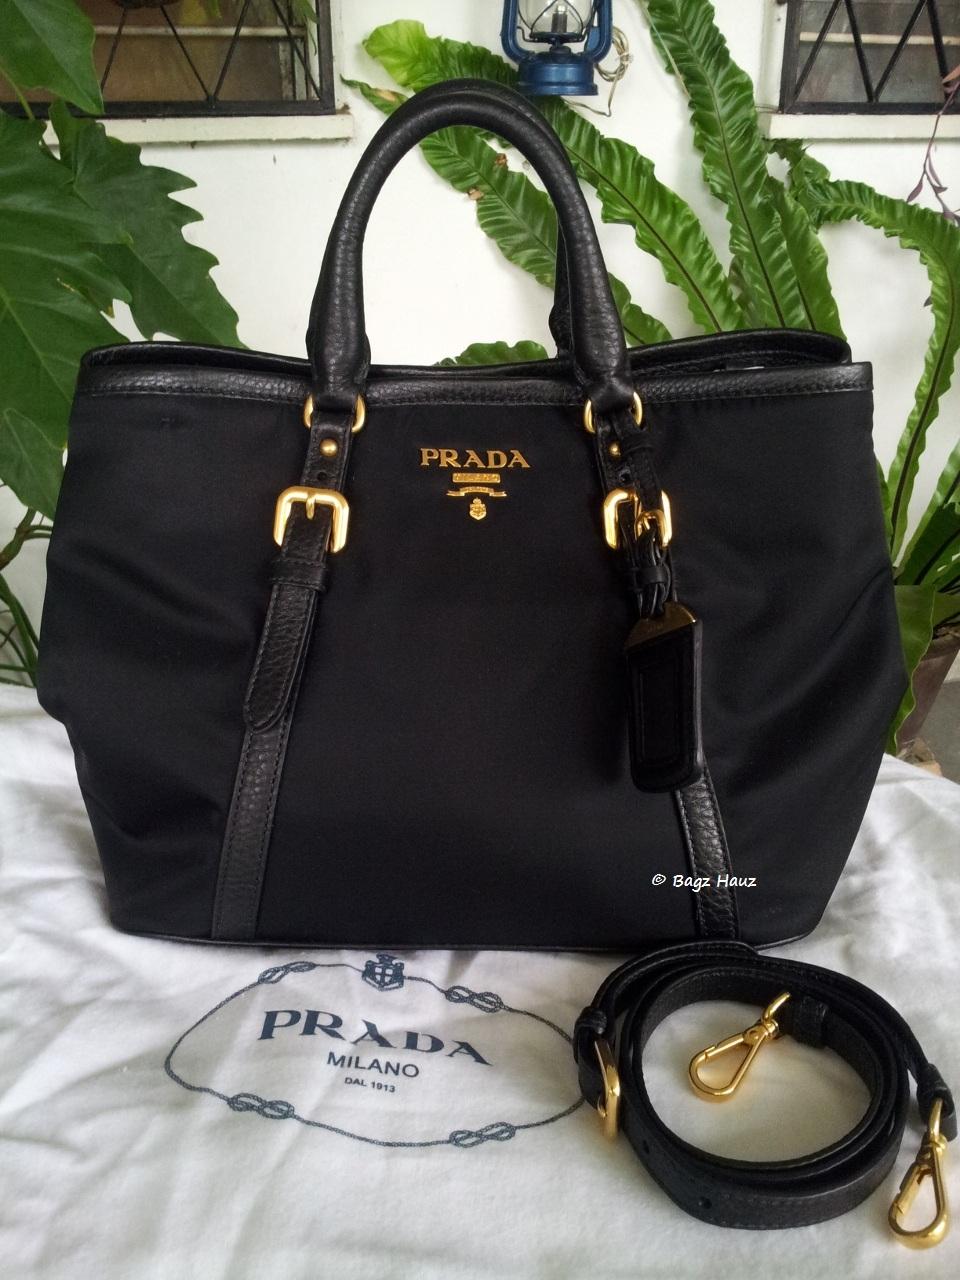 c6c06c75f5e139 ... uk pastime prada bag bn1841 . prada bn1841 tessuto nylon tote in black  881f4 844cc ...